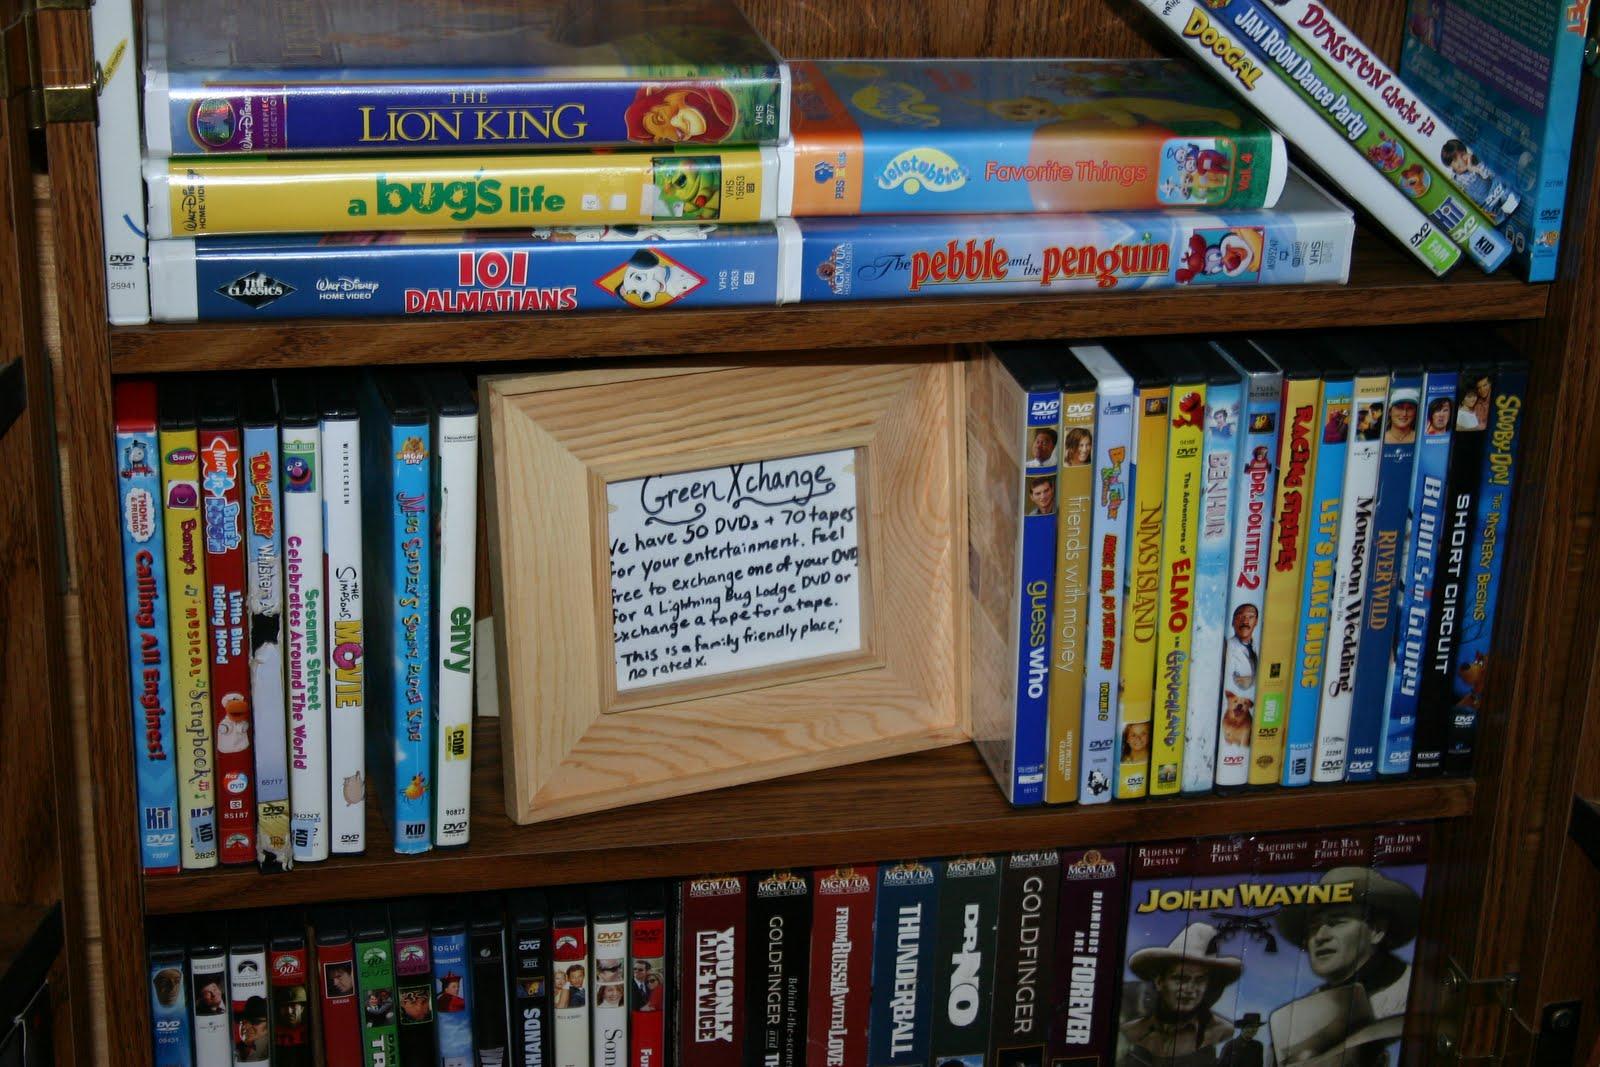 Lightning Bug Lodge The Green Exchange Lbl Dvd Library